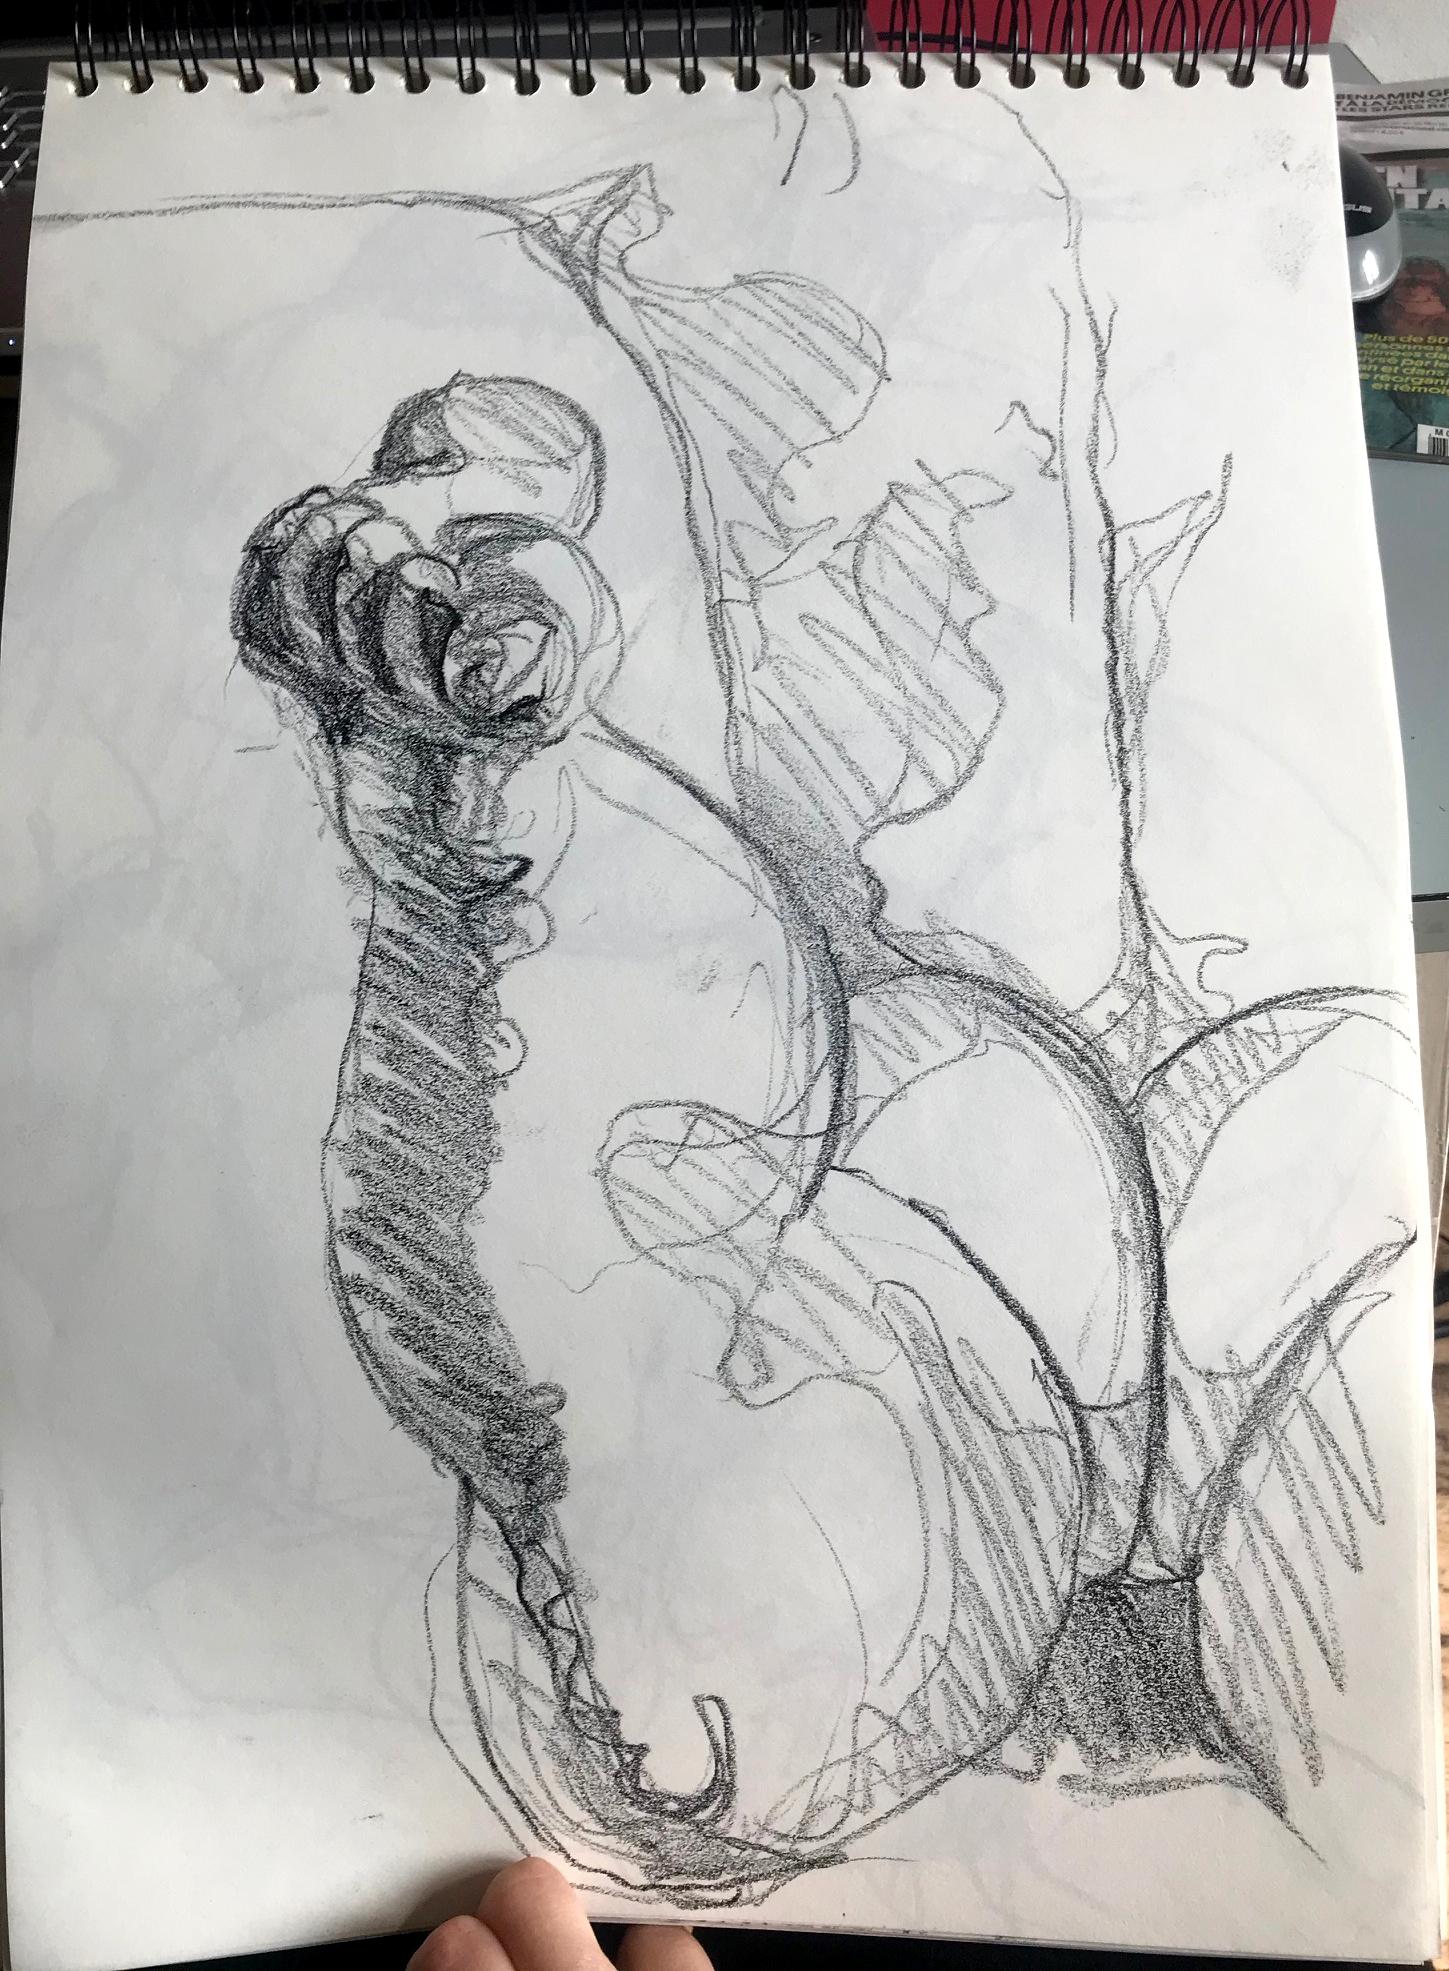 Dessin pied graphite  cours de dessin